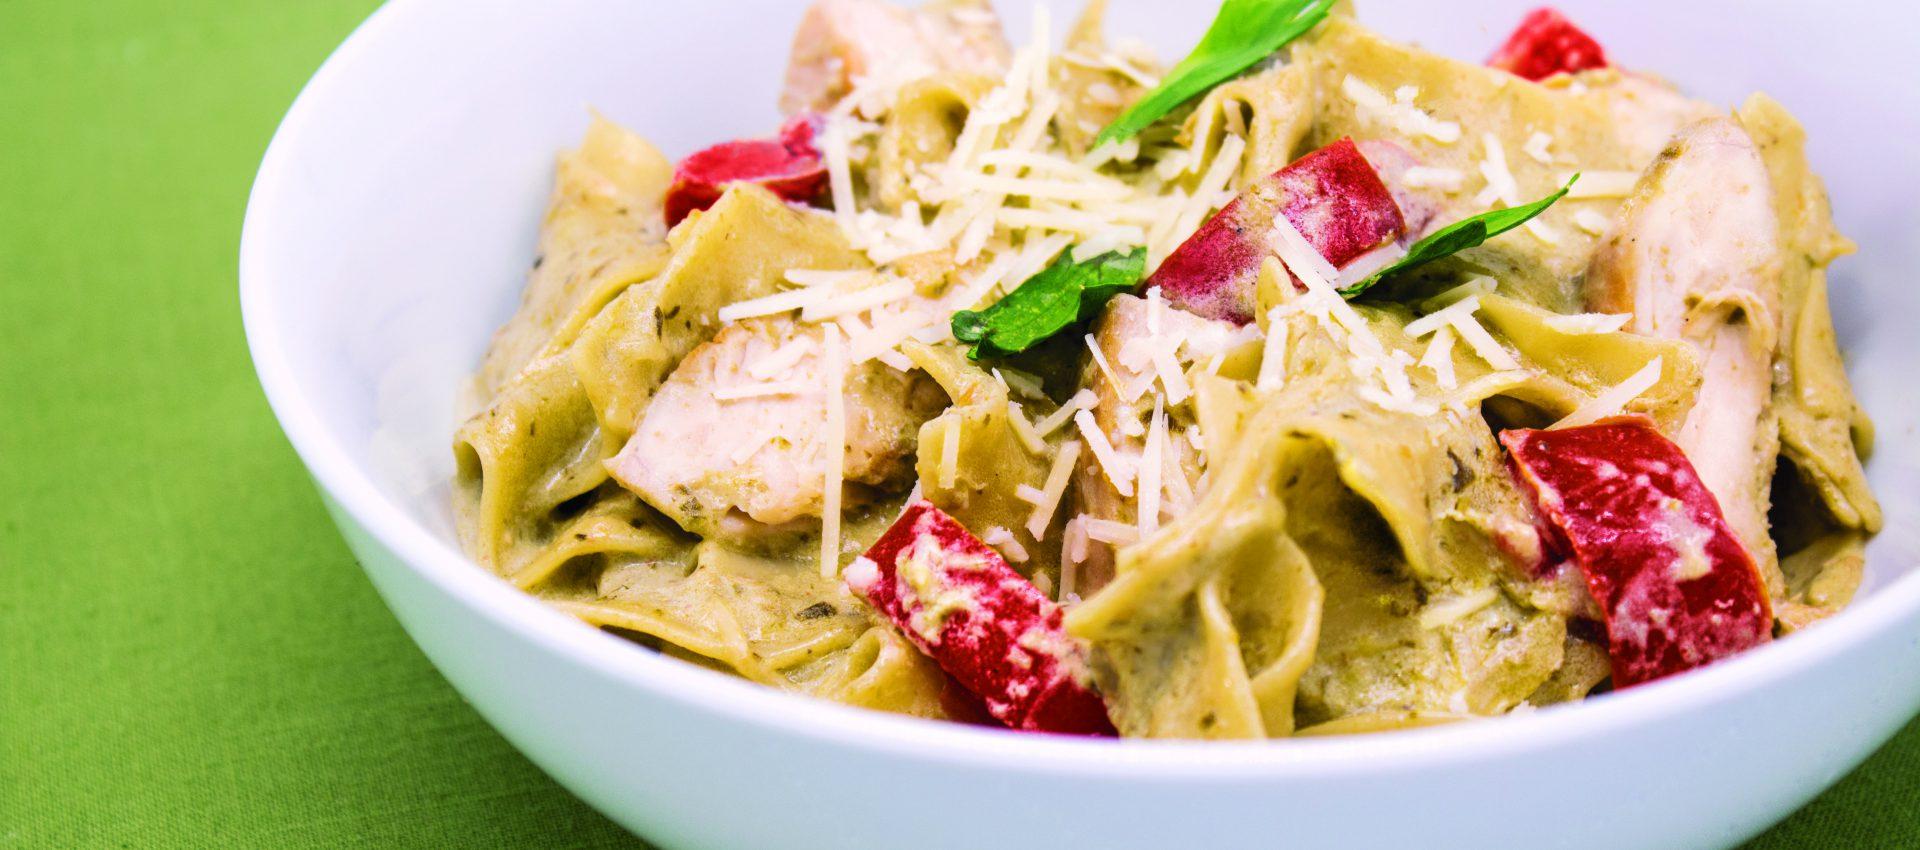 IMG_2236_V0R1_F-1920x850 Alfredo Pesto Noodles with Chicken